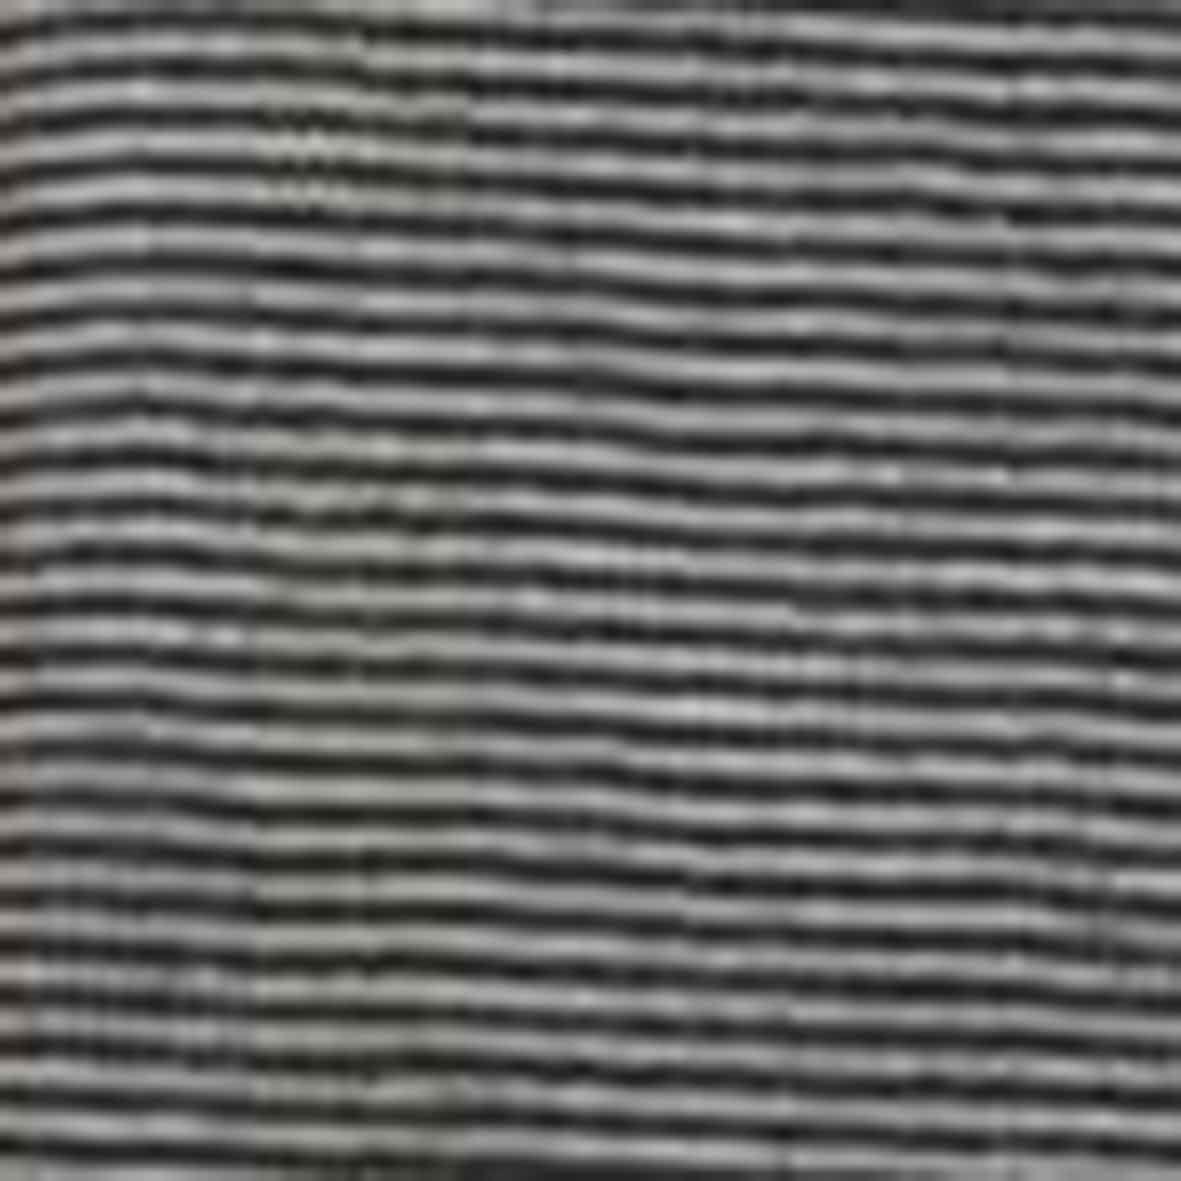 charc/nat stripe